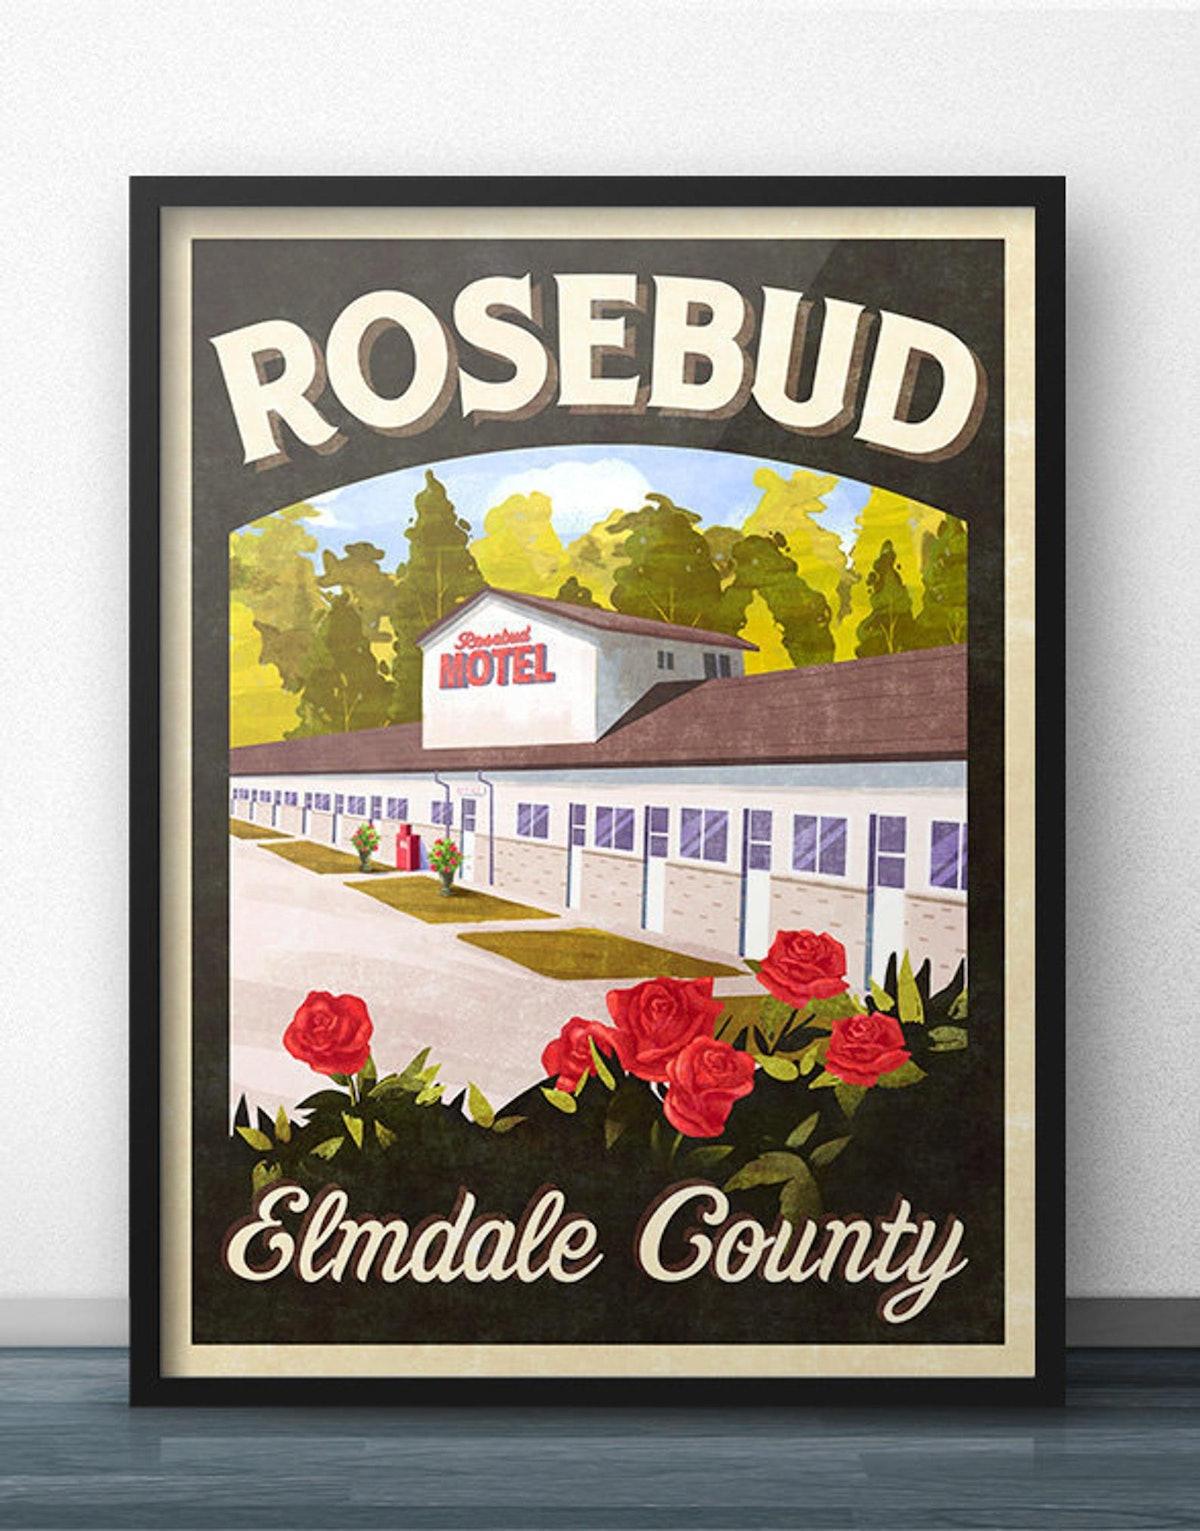 Rosebud Motel Vintage Travel Poster